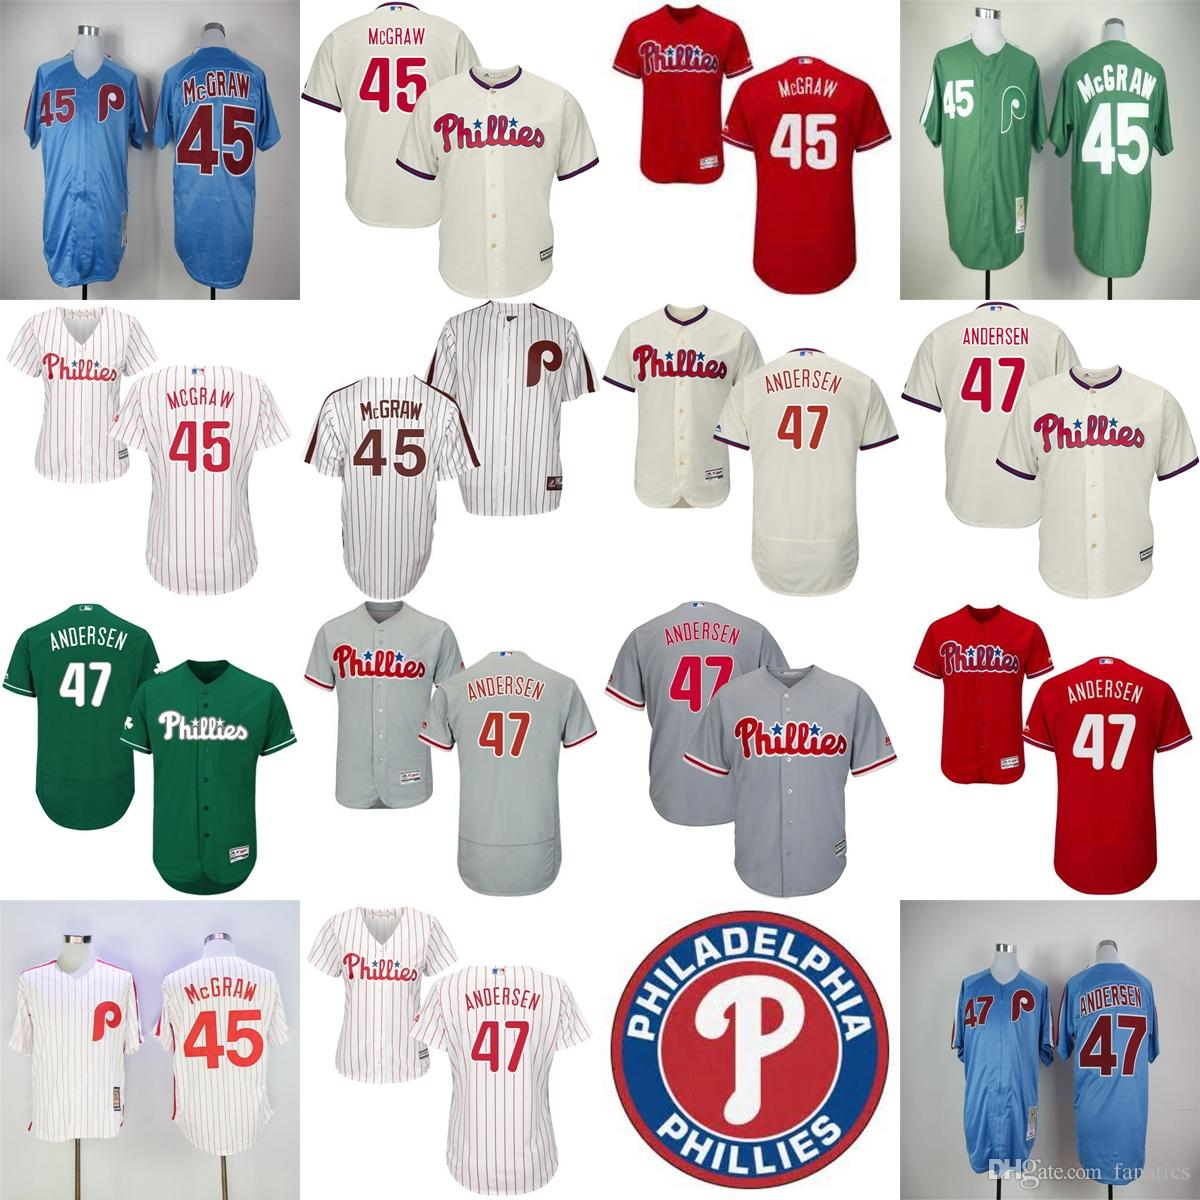 7815ef2c004 ... Baseball Jerseys White Grey 2017 Mens Womens Kids Philadelphia Phillies  45 Tug McGraw 47 Larry Andersen White Grey Beige Blue ...